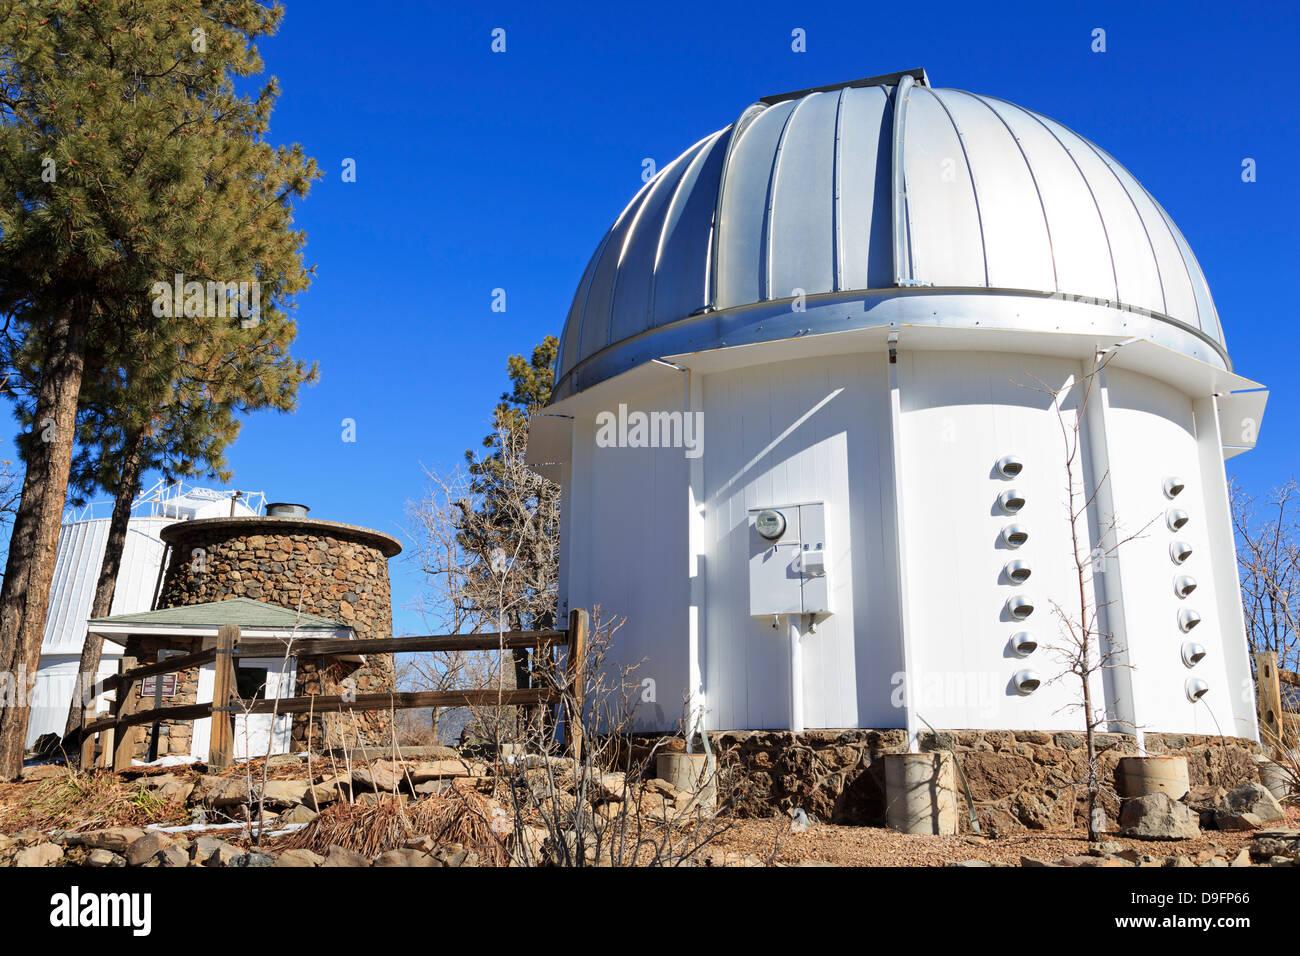 Lowell Observatory, Flagstaff, Arizona, USA - Stock Image